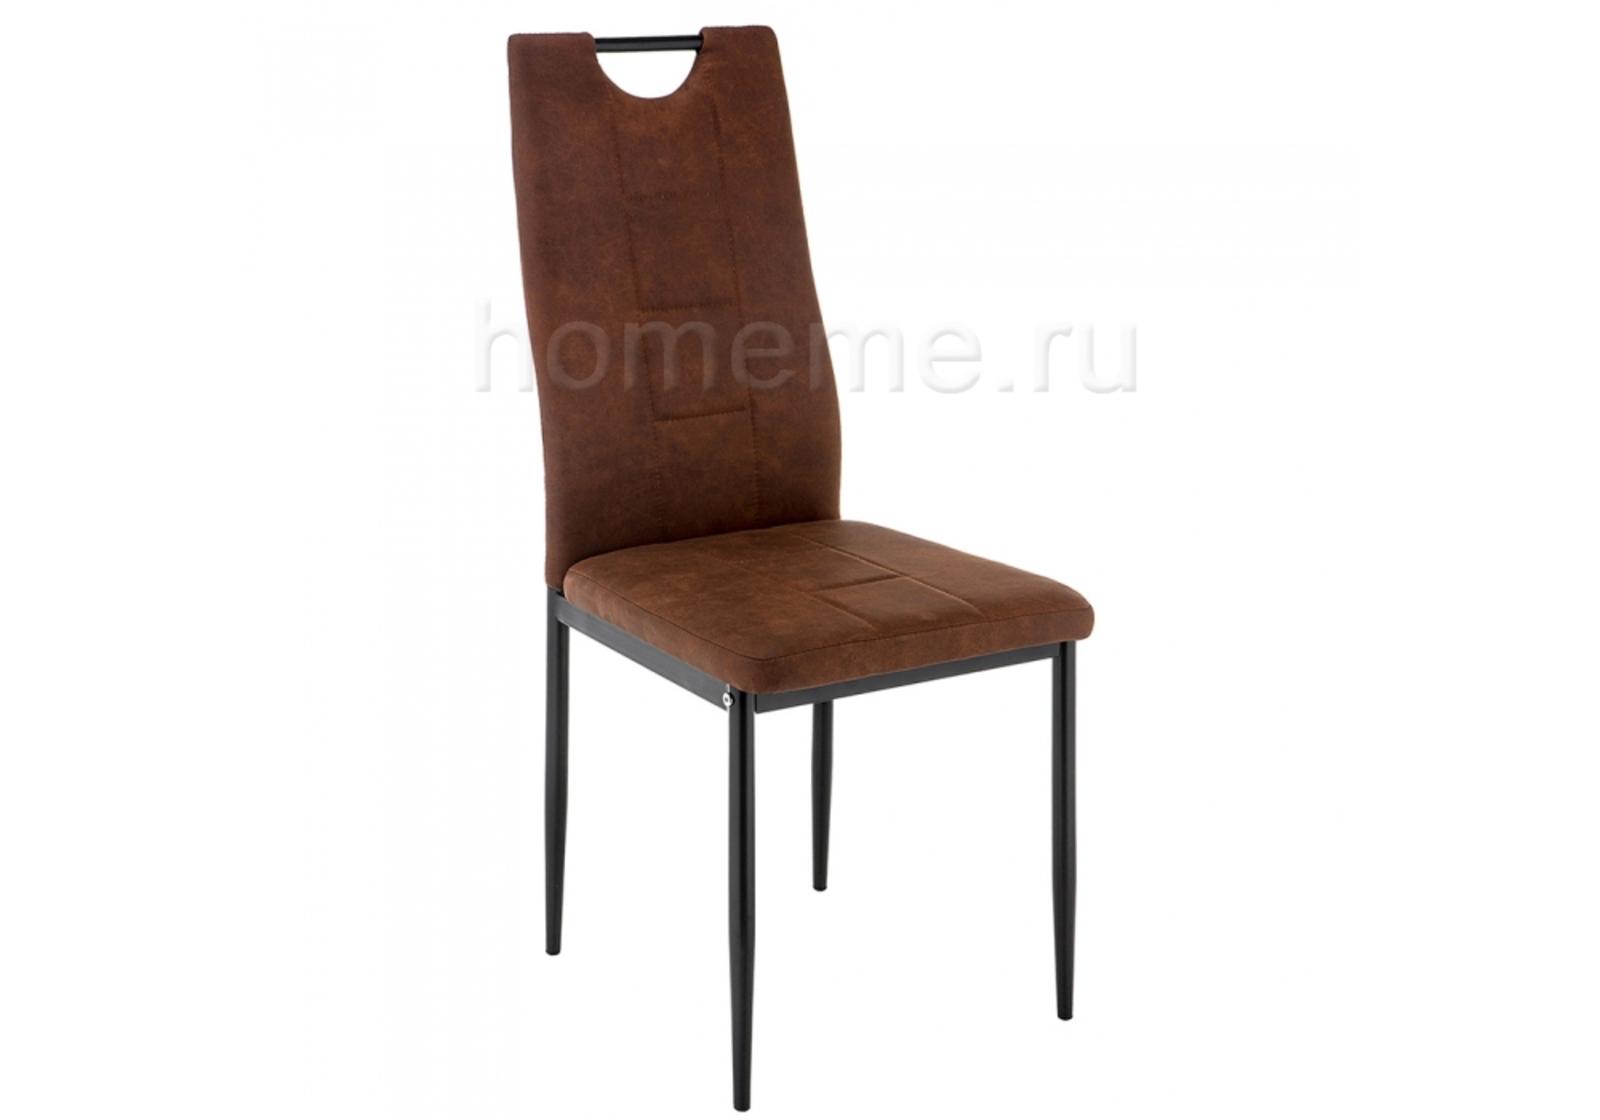 Стул HomeMe Hant коричневый 11225 от Homeme.ru